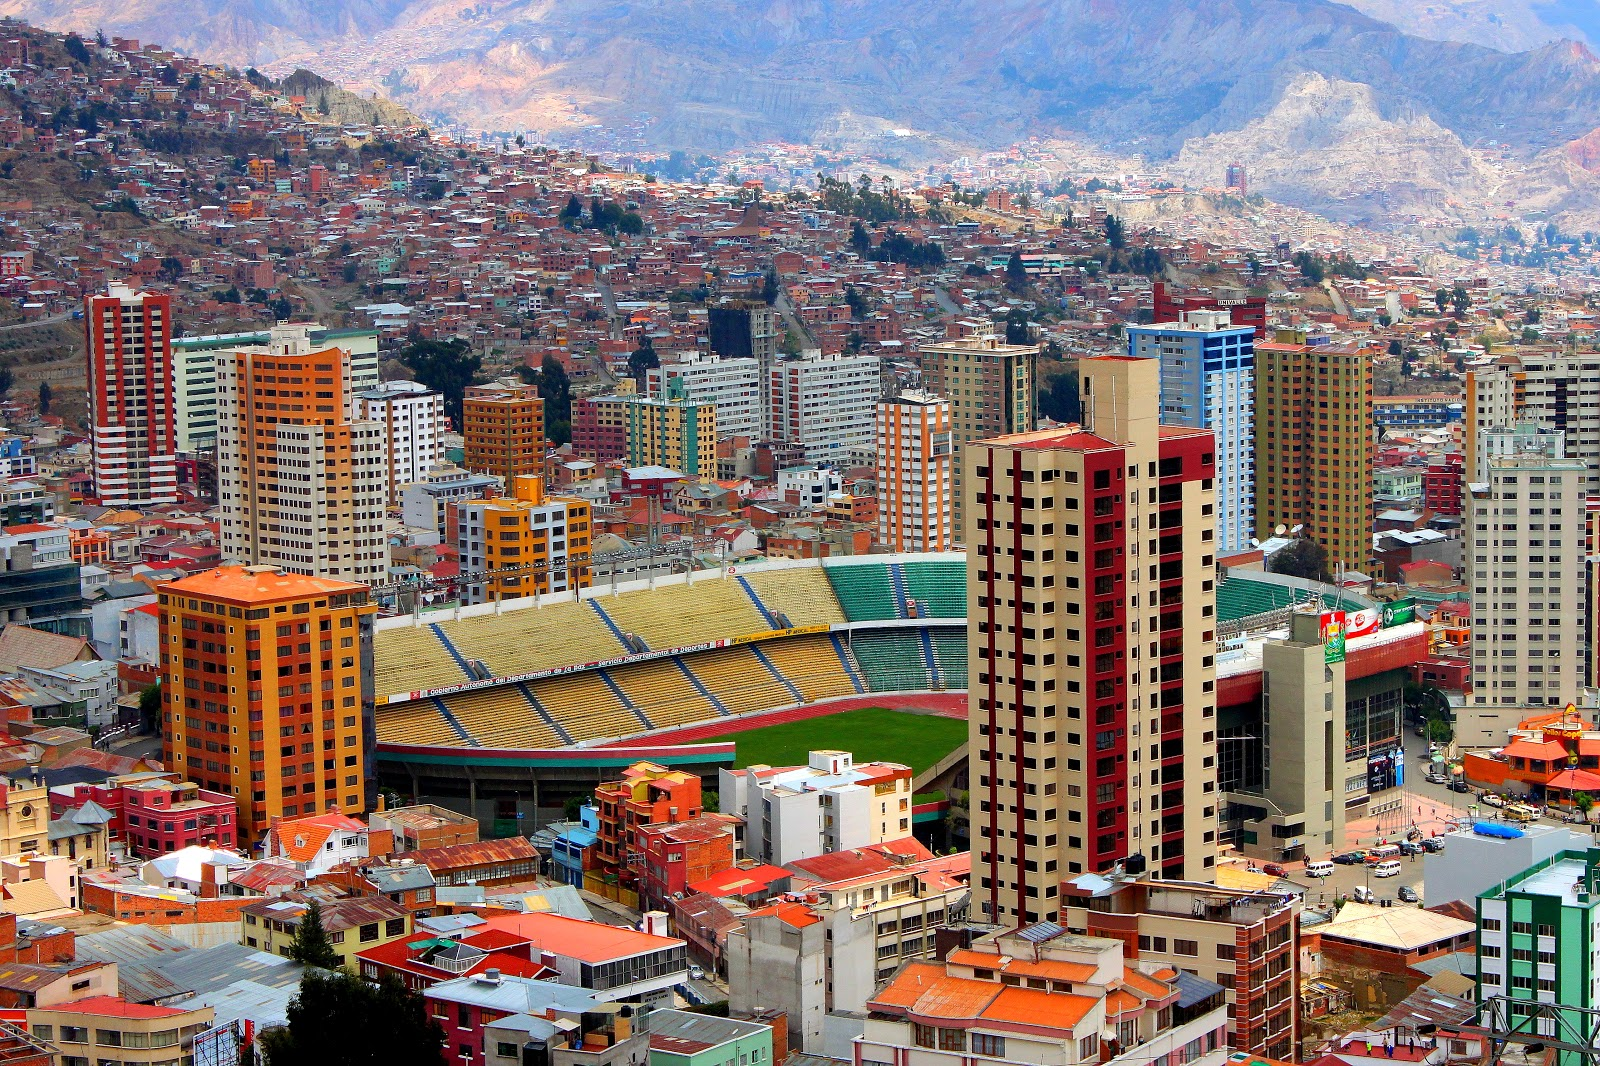 28 ciudades maravillosas taringa for Casas minimalistas la paz bolivia